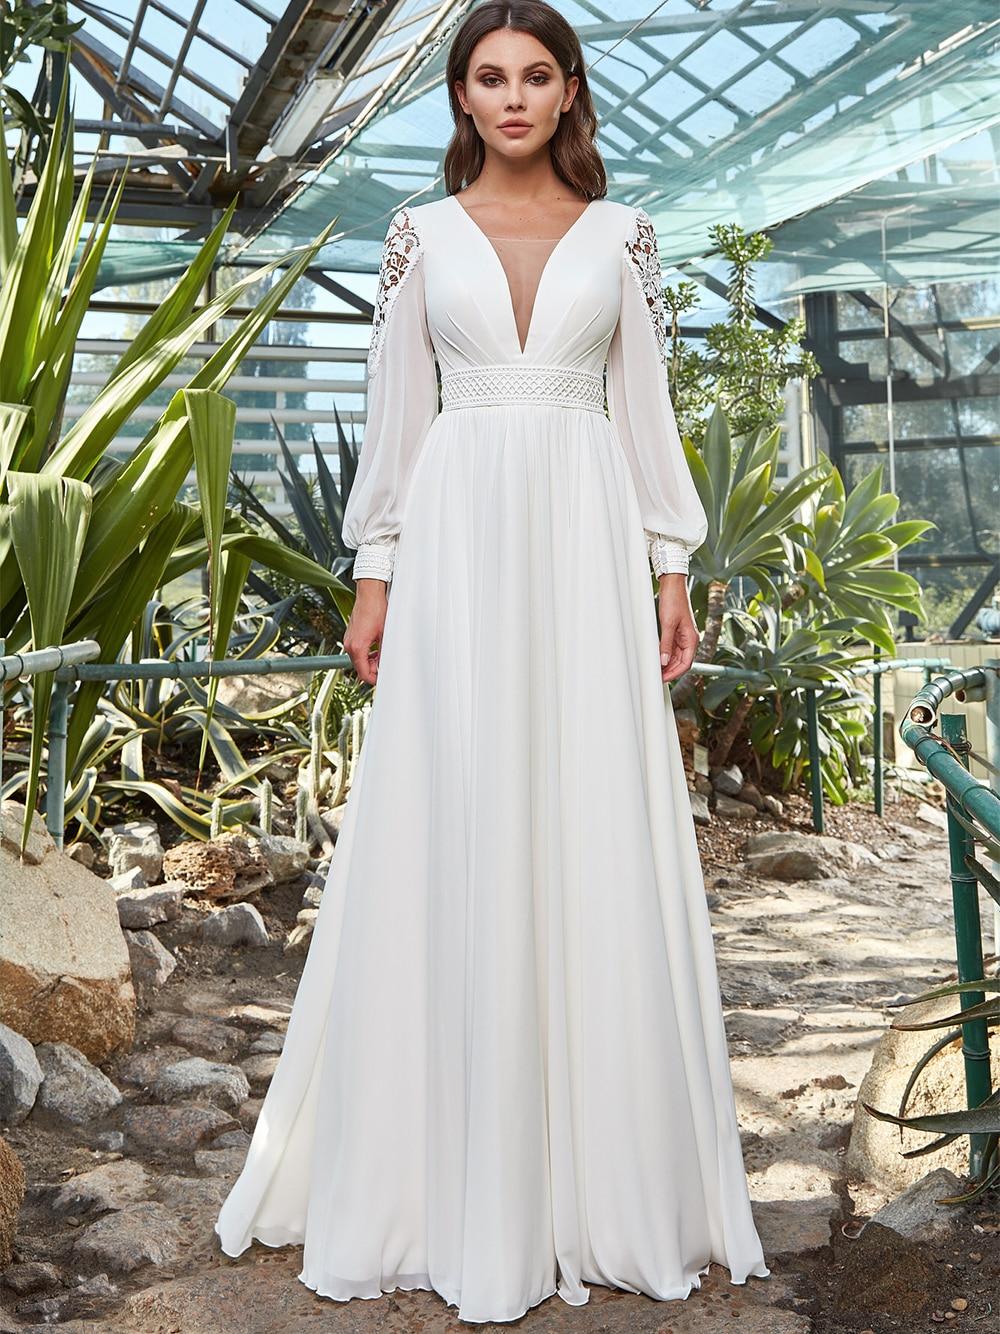 bohemian-beach-chiffon-a-line-wedding-dress-v-neck-simple-cut-out-2021-lace-long-sleeves-corset-back-bridesmaid-bridal-gowns